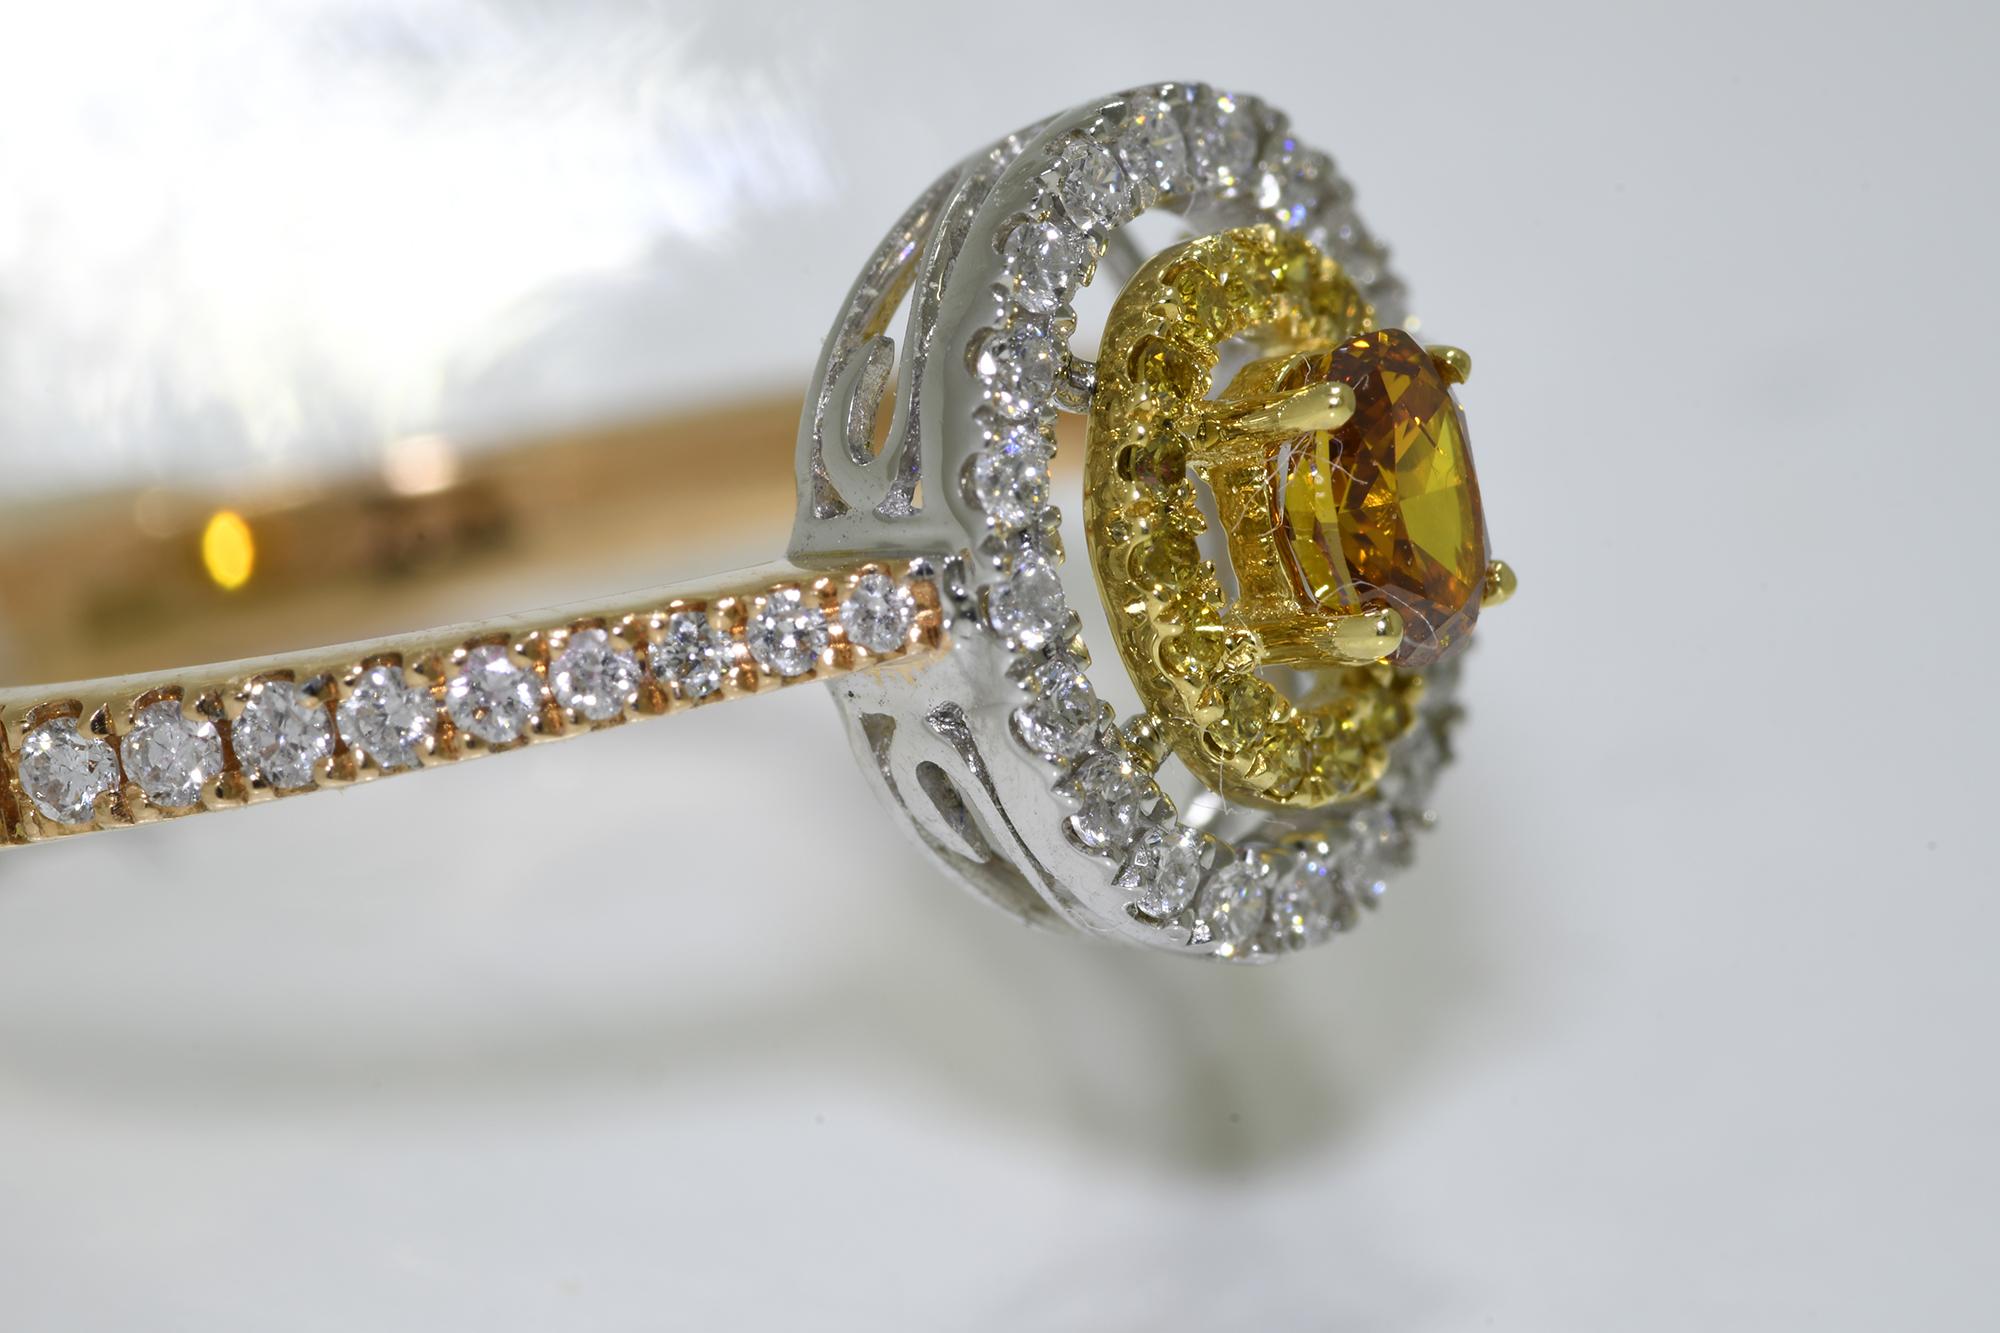 Oval Cognac Diamond Ring - Image 3 of 4